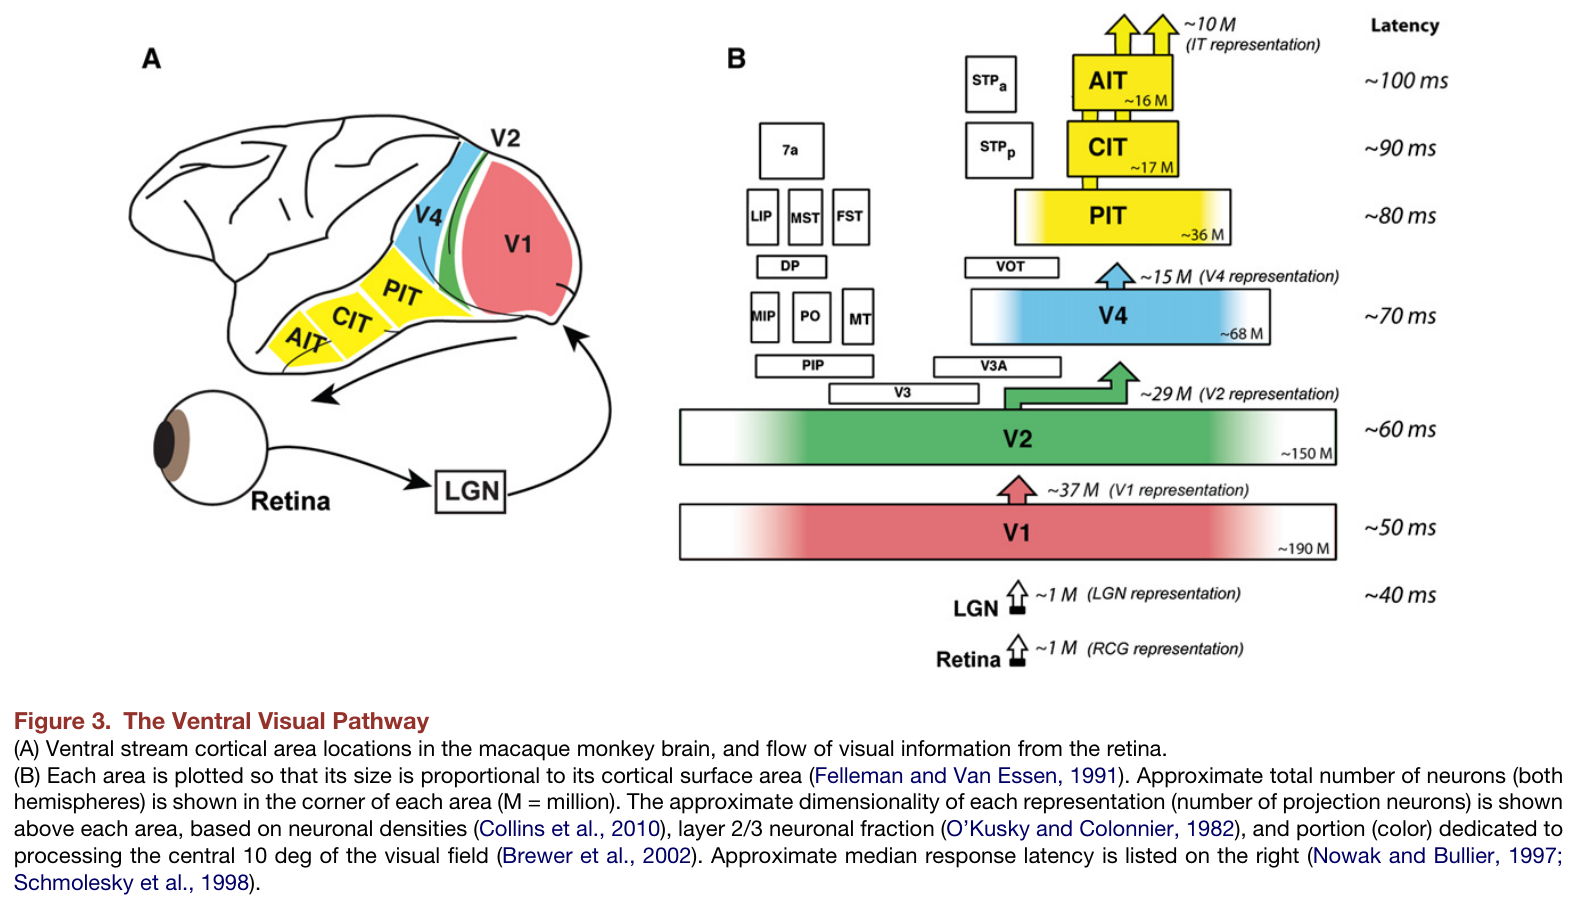 0a40b7c3e14 Synaptic transmission takes 1-2ms; dendritic propagation ?, axonal  propagation ~1ms (e.g. pyramidal antidromic activation latency 1.2-1.3ms),  so each layer ...